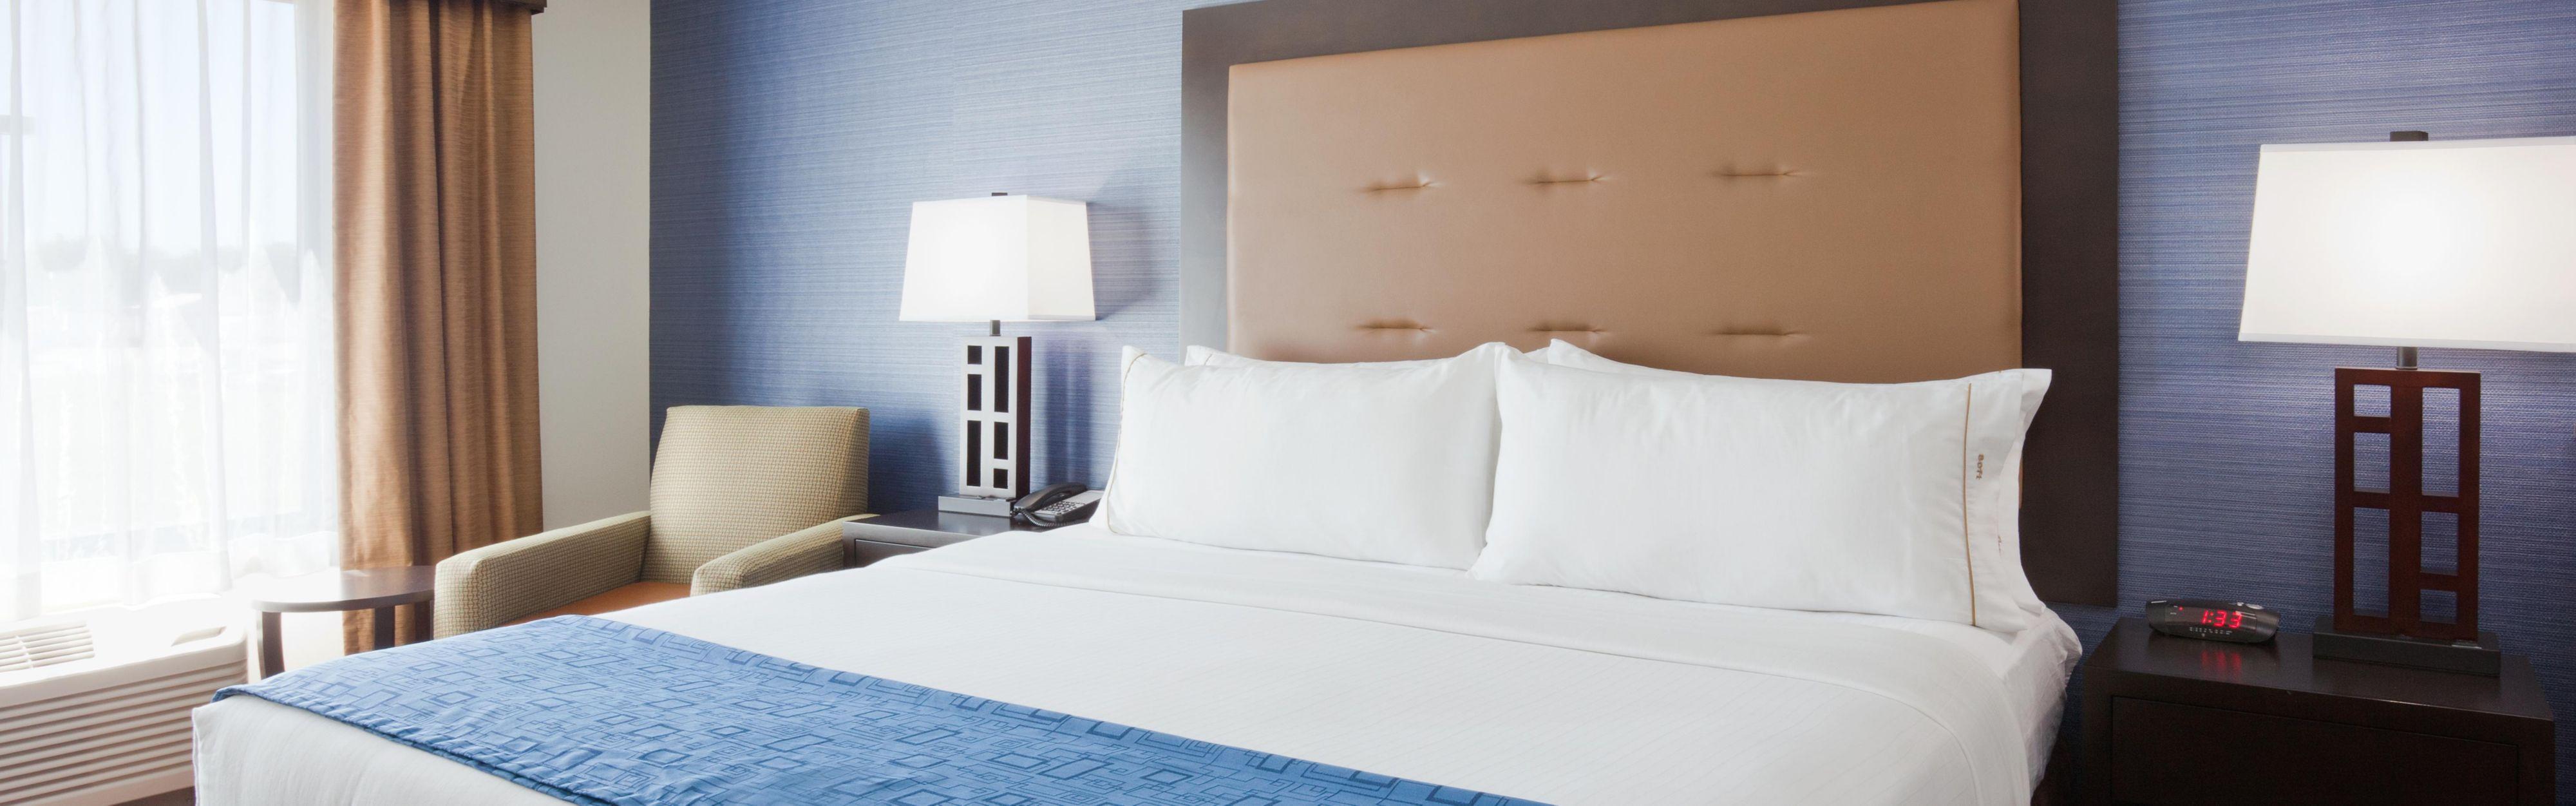 Holiday Inn Express & Suites Fort Dodge image 1